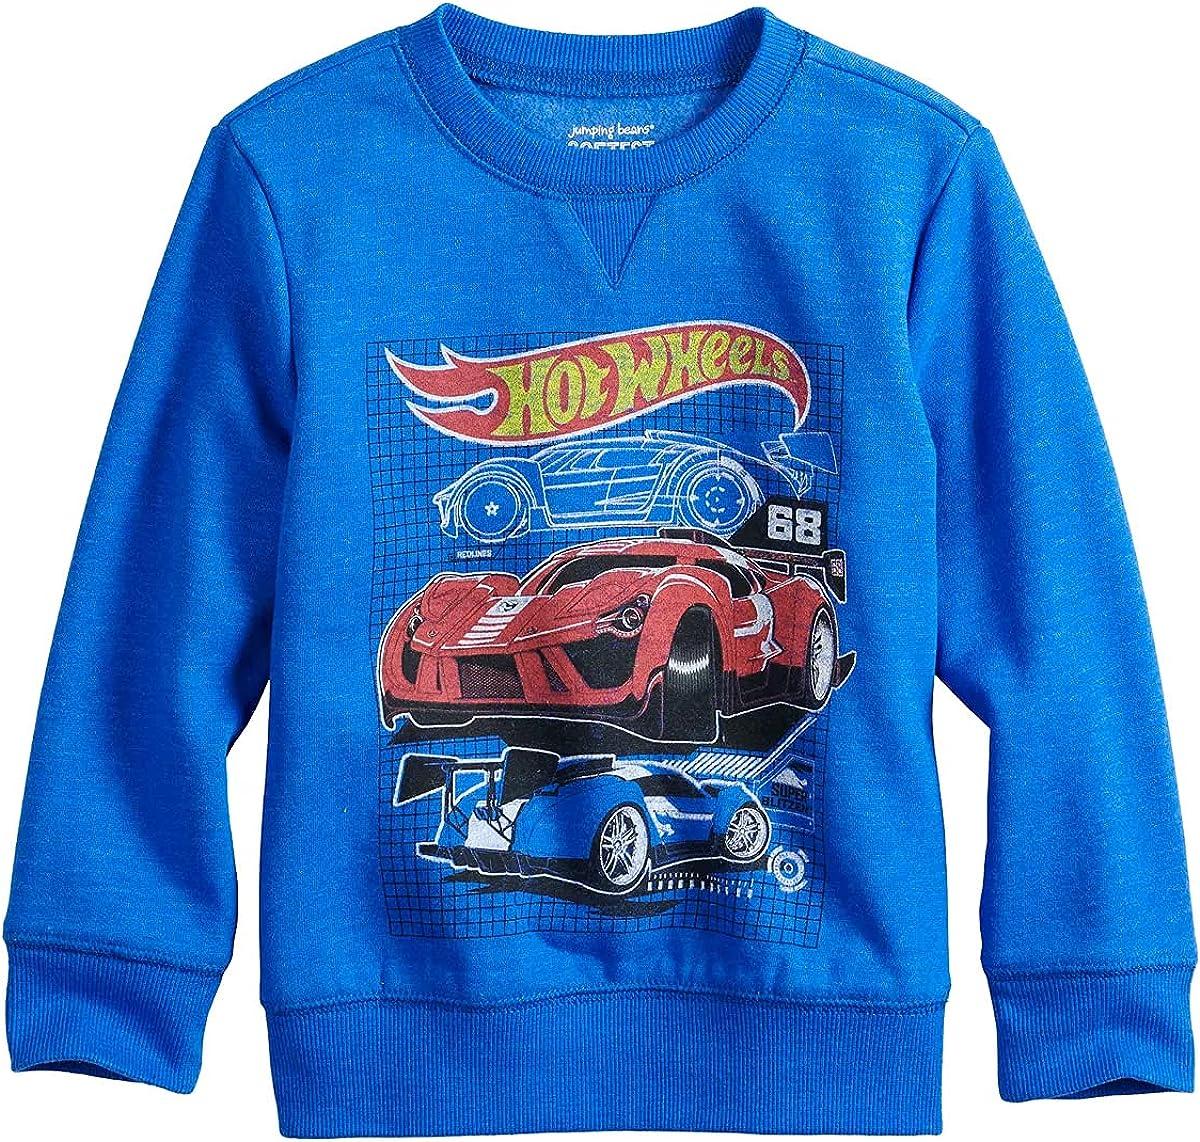 Infant Boys Jumping Beans Hot Wheels Sweatshirt, Blue (Infant, 3_months)